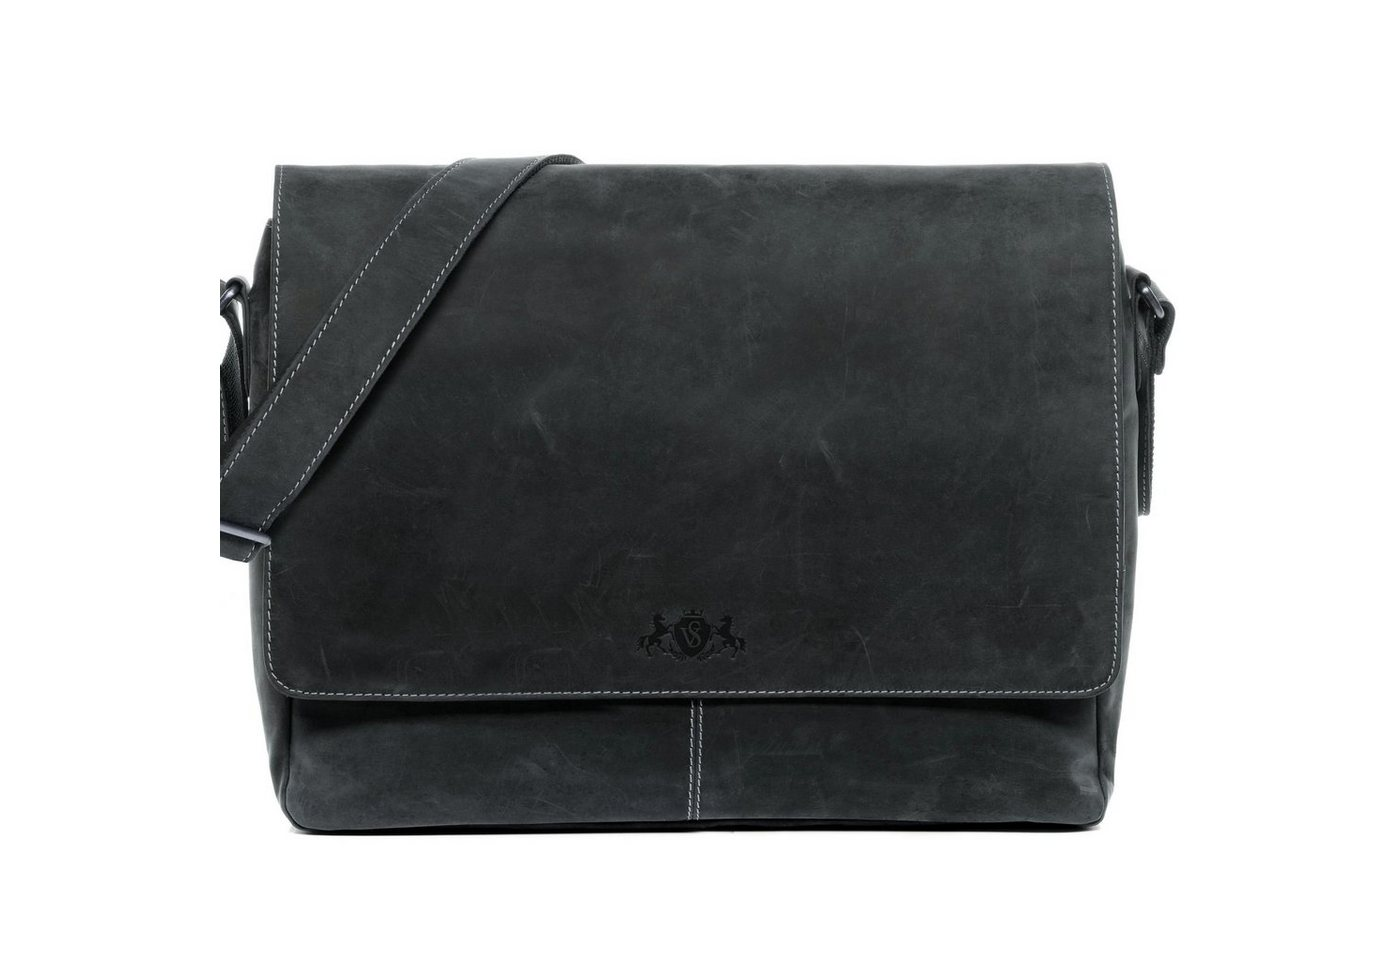 "SID & VAIN Messenger Bag ""SPENCER"", Umhängetasche Laptoptasche 15 Zoll Herren echt Leder Vintage schwarz"